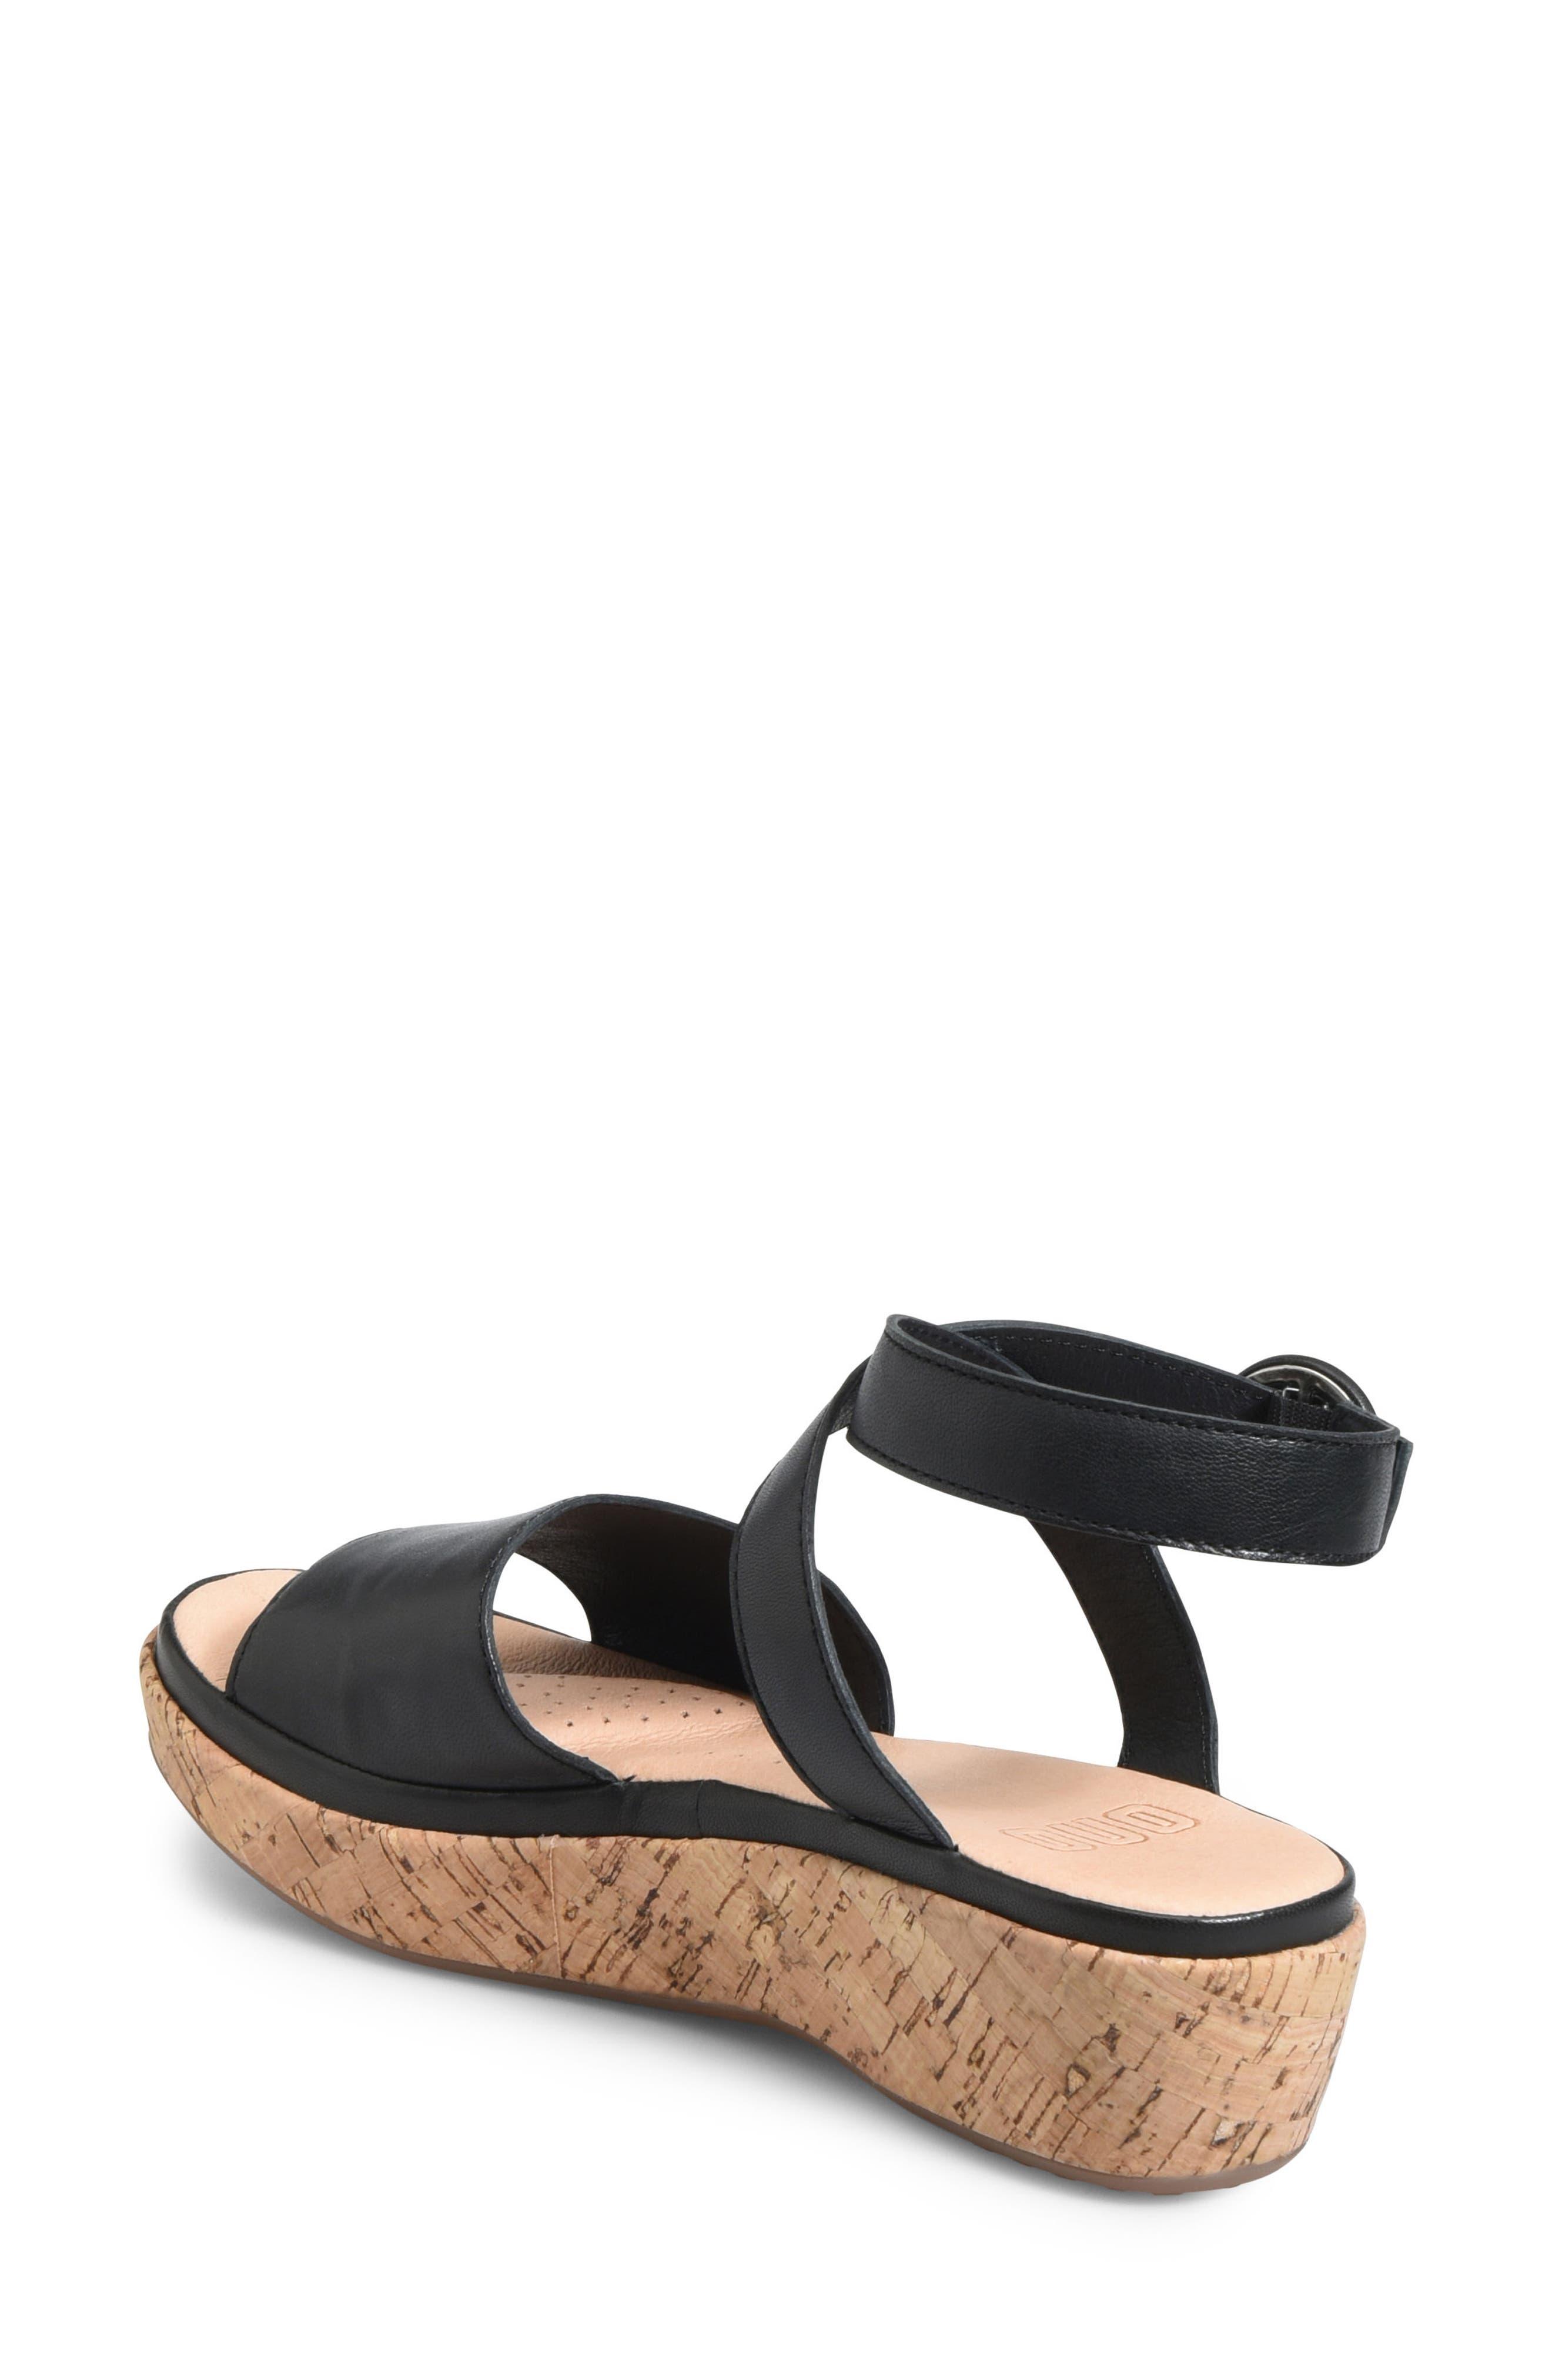 ONO, Dreamy Platform Wedge Sandal, Alternate thumbnail 2, color, BLACK LEATHER